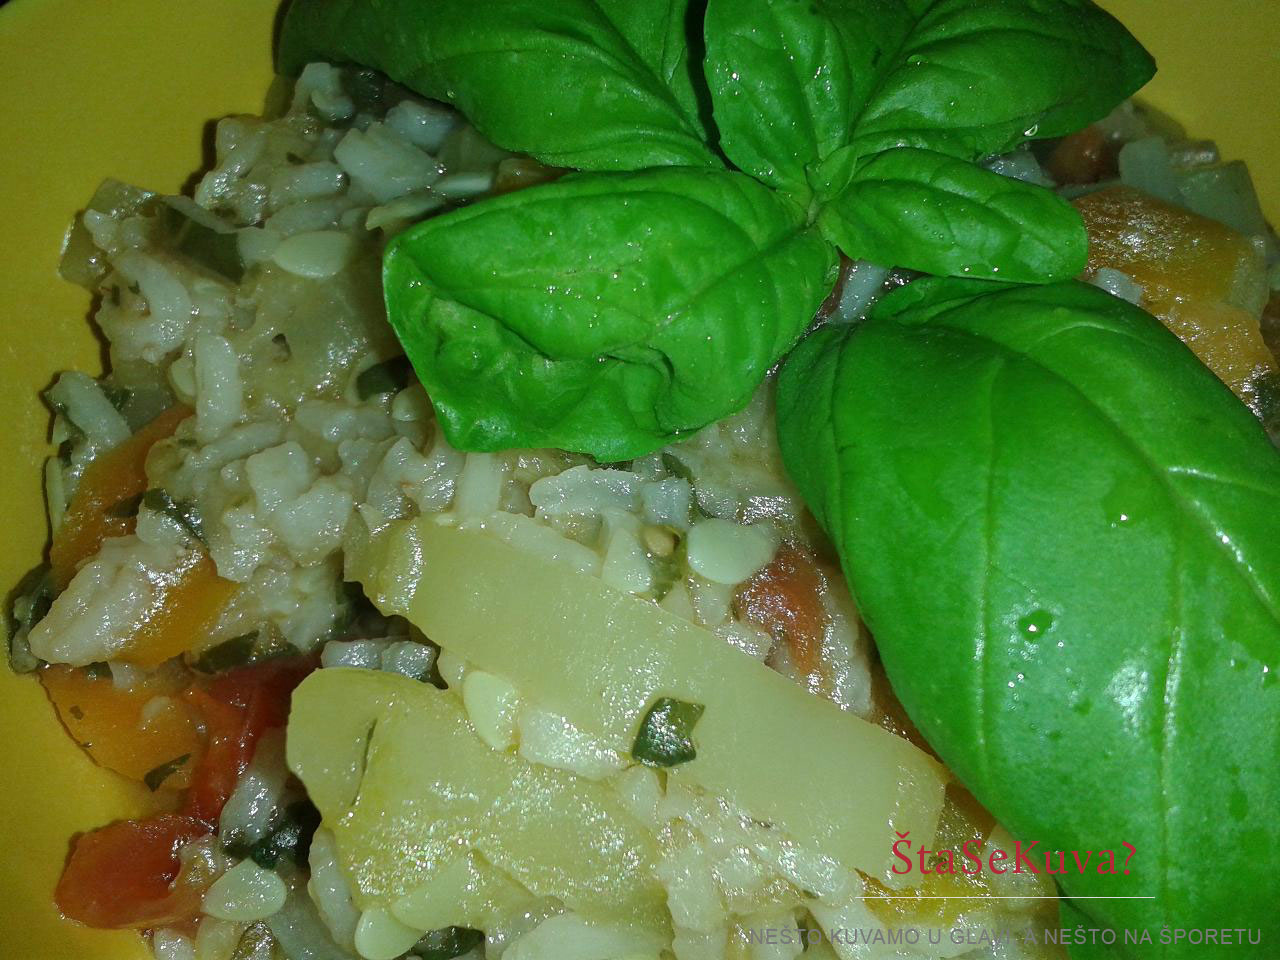 Šareni rižoto od povrća